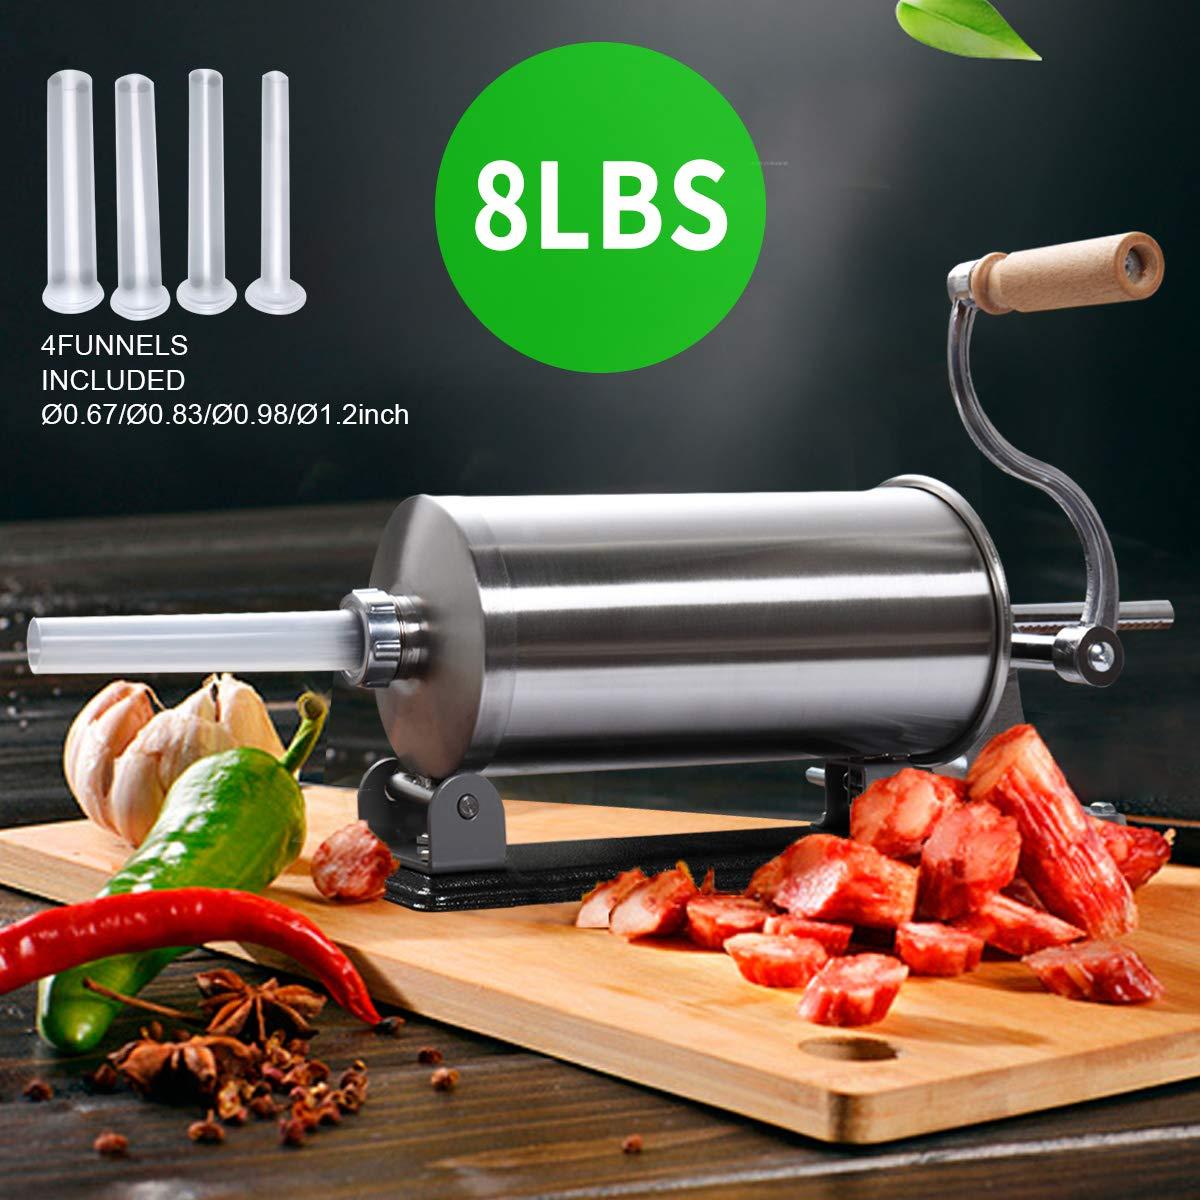 8 LBS Commercial Sausage Stuffers Meat Stuffing Maker Kit Stainless Steel Horizontal by thegreatshopman